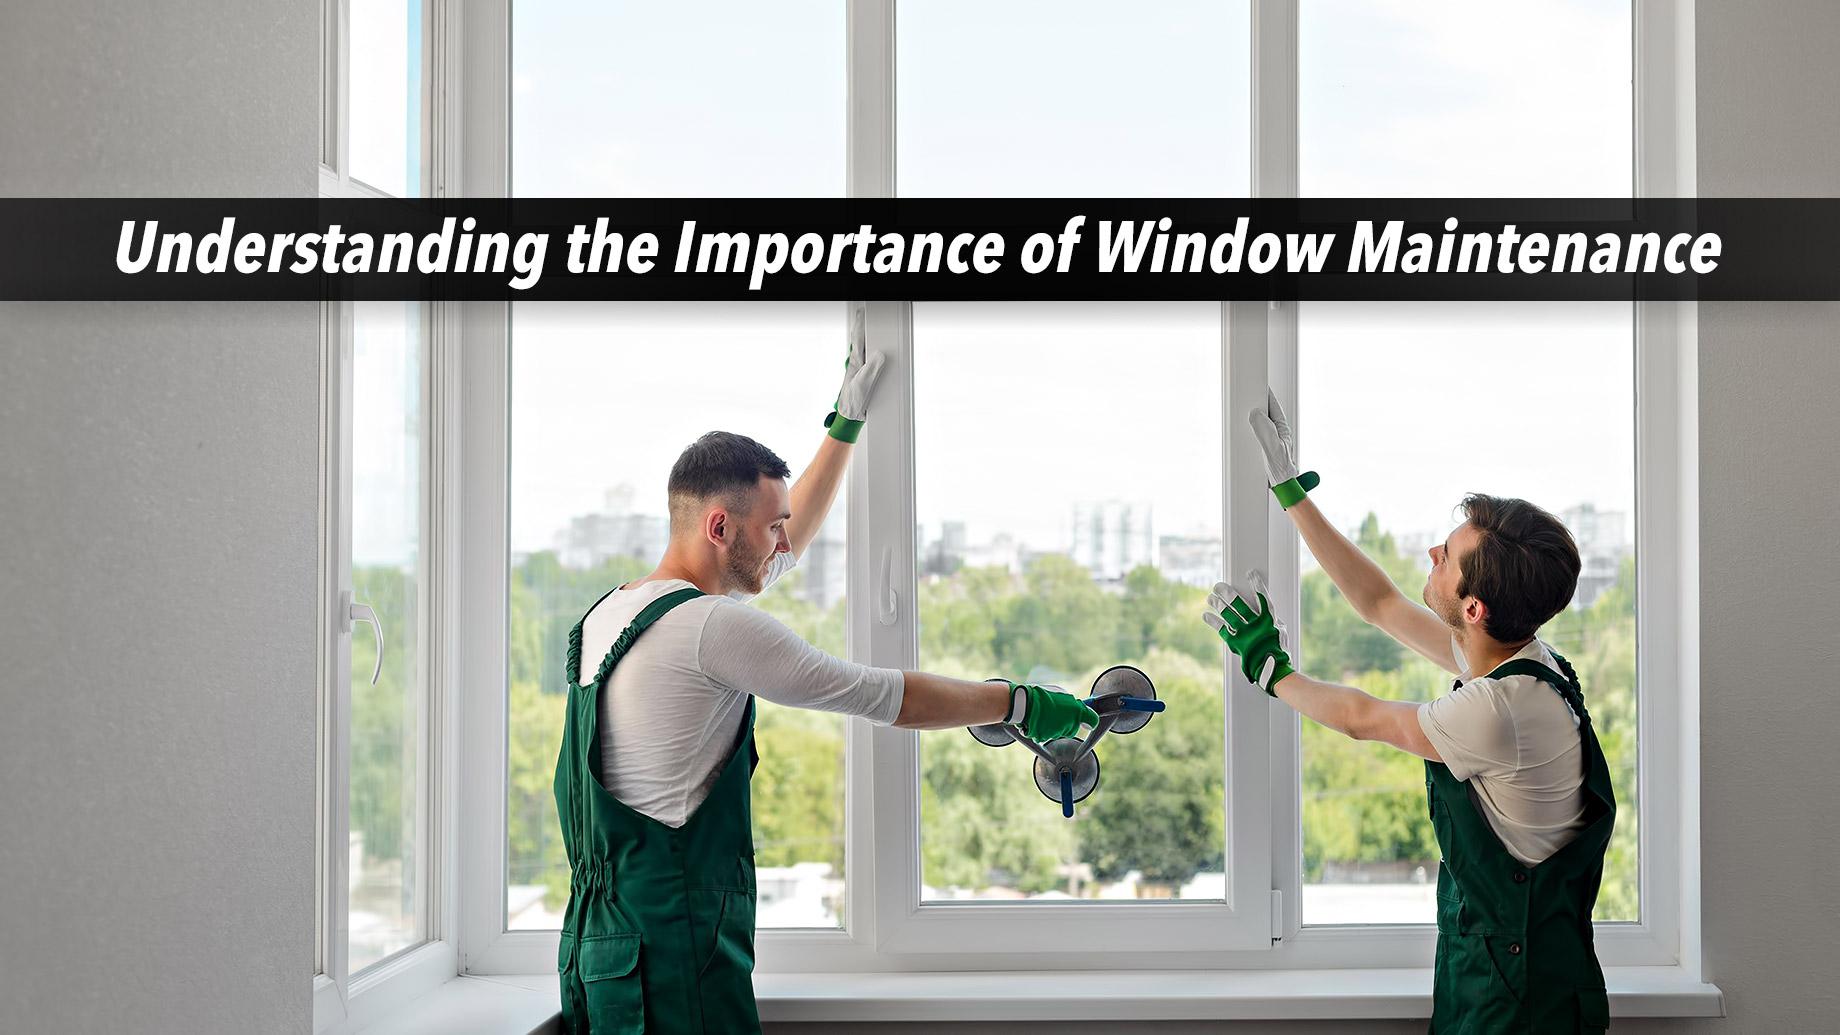 Understanding the Importance of Window Maintenance